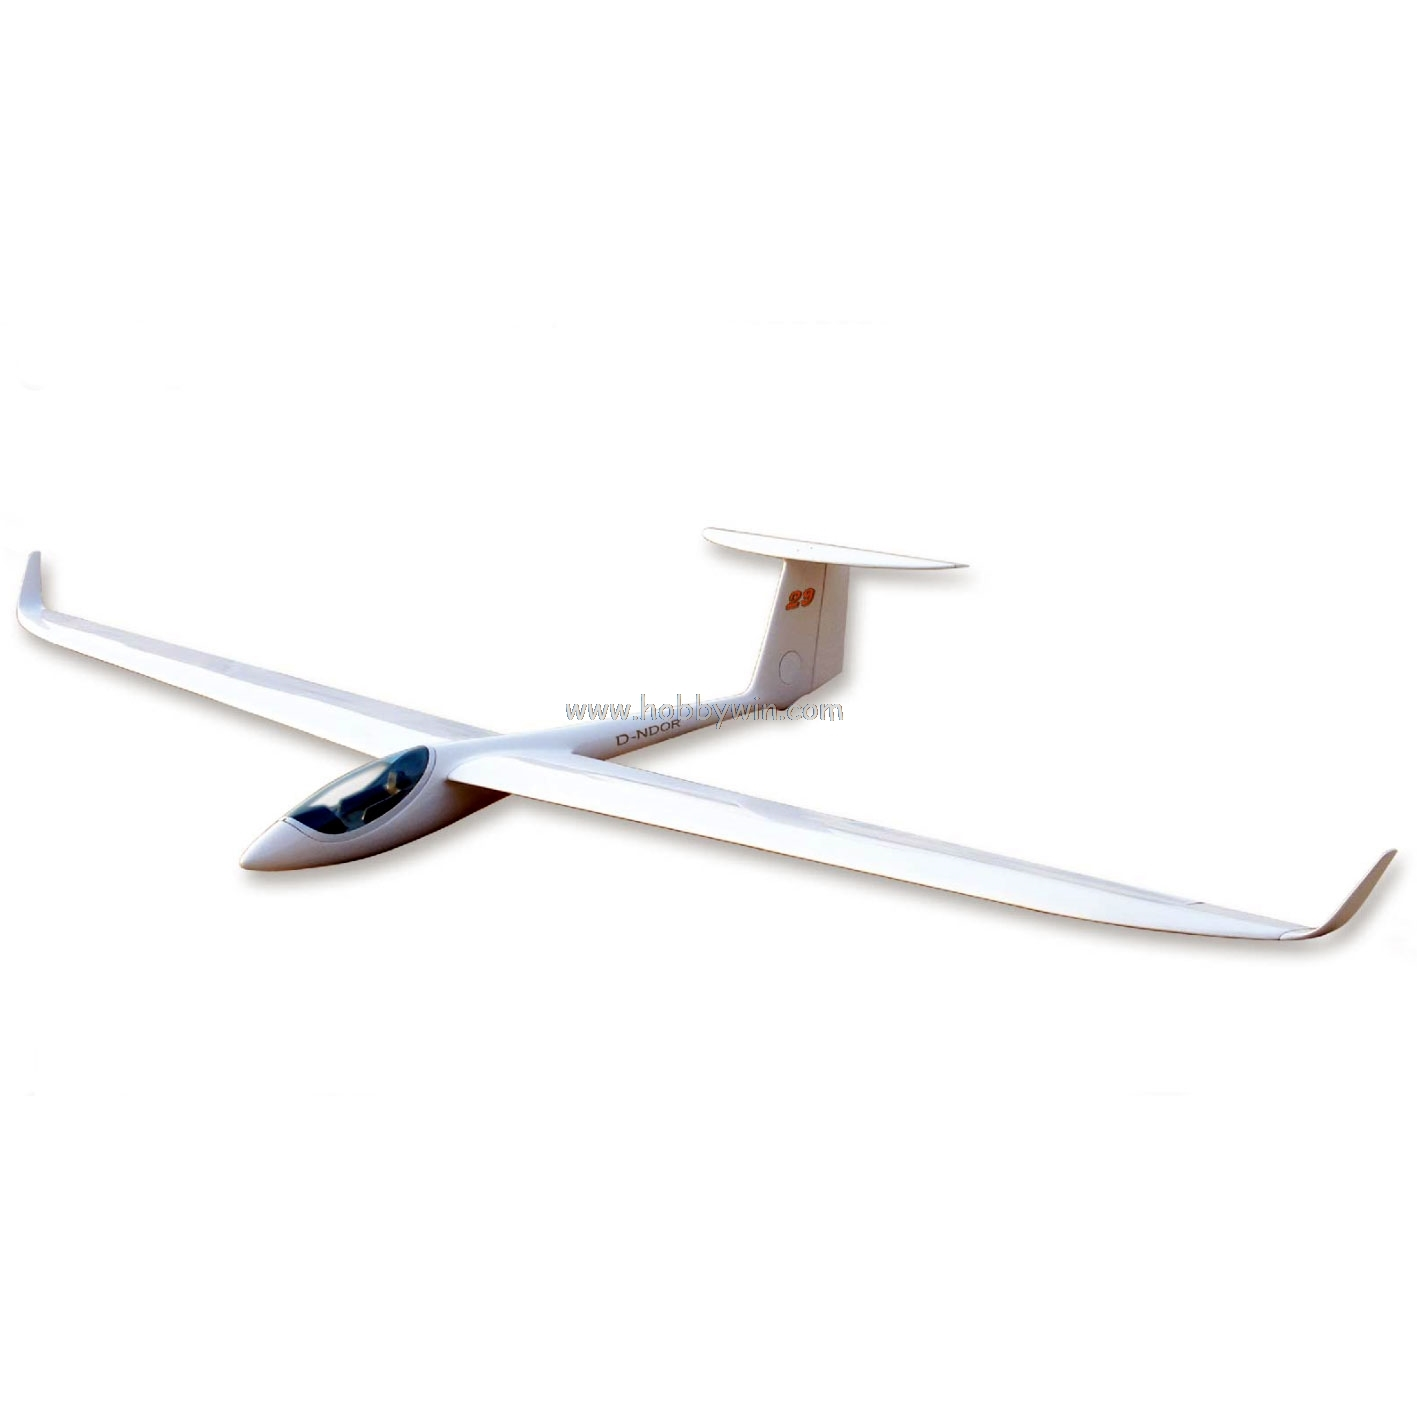 Condor Magic EVO4 Glider 3000mm Fiberglass Unpower version KIT without electronic part RC model sailplane